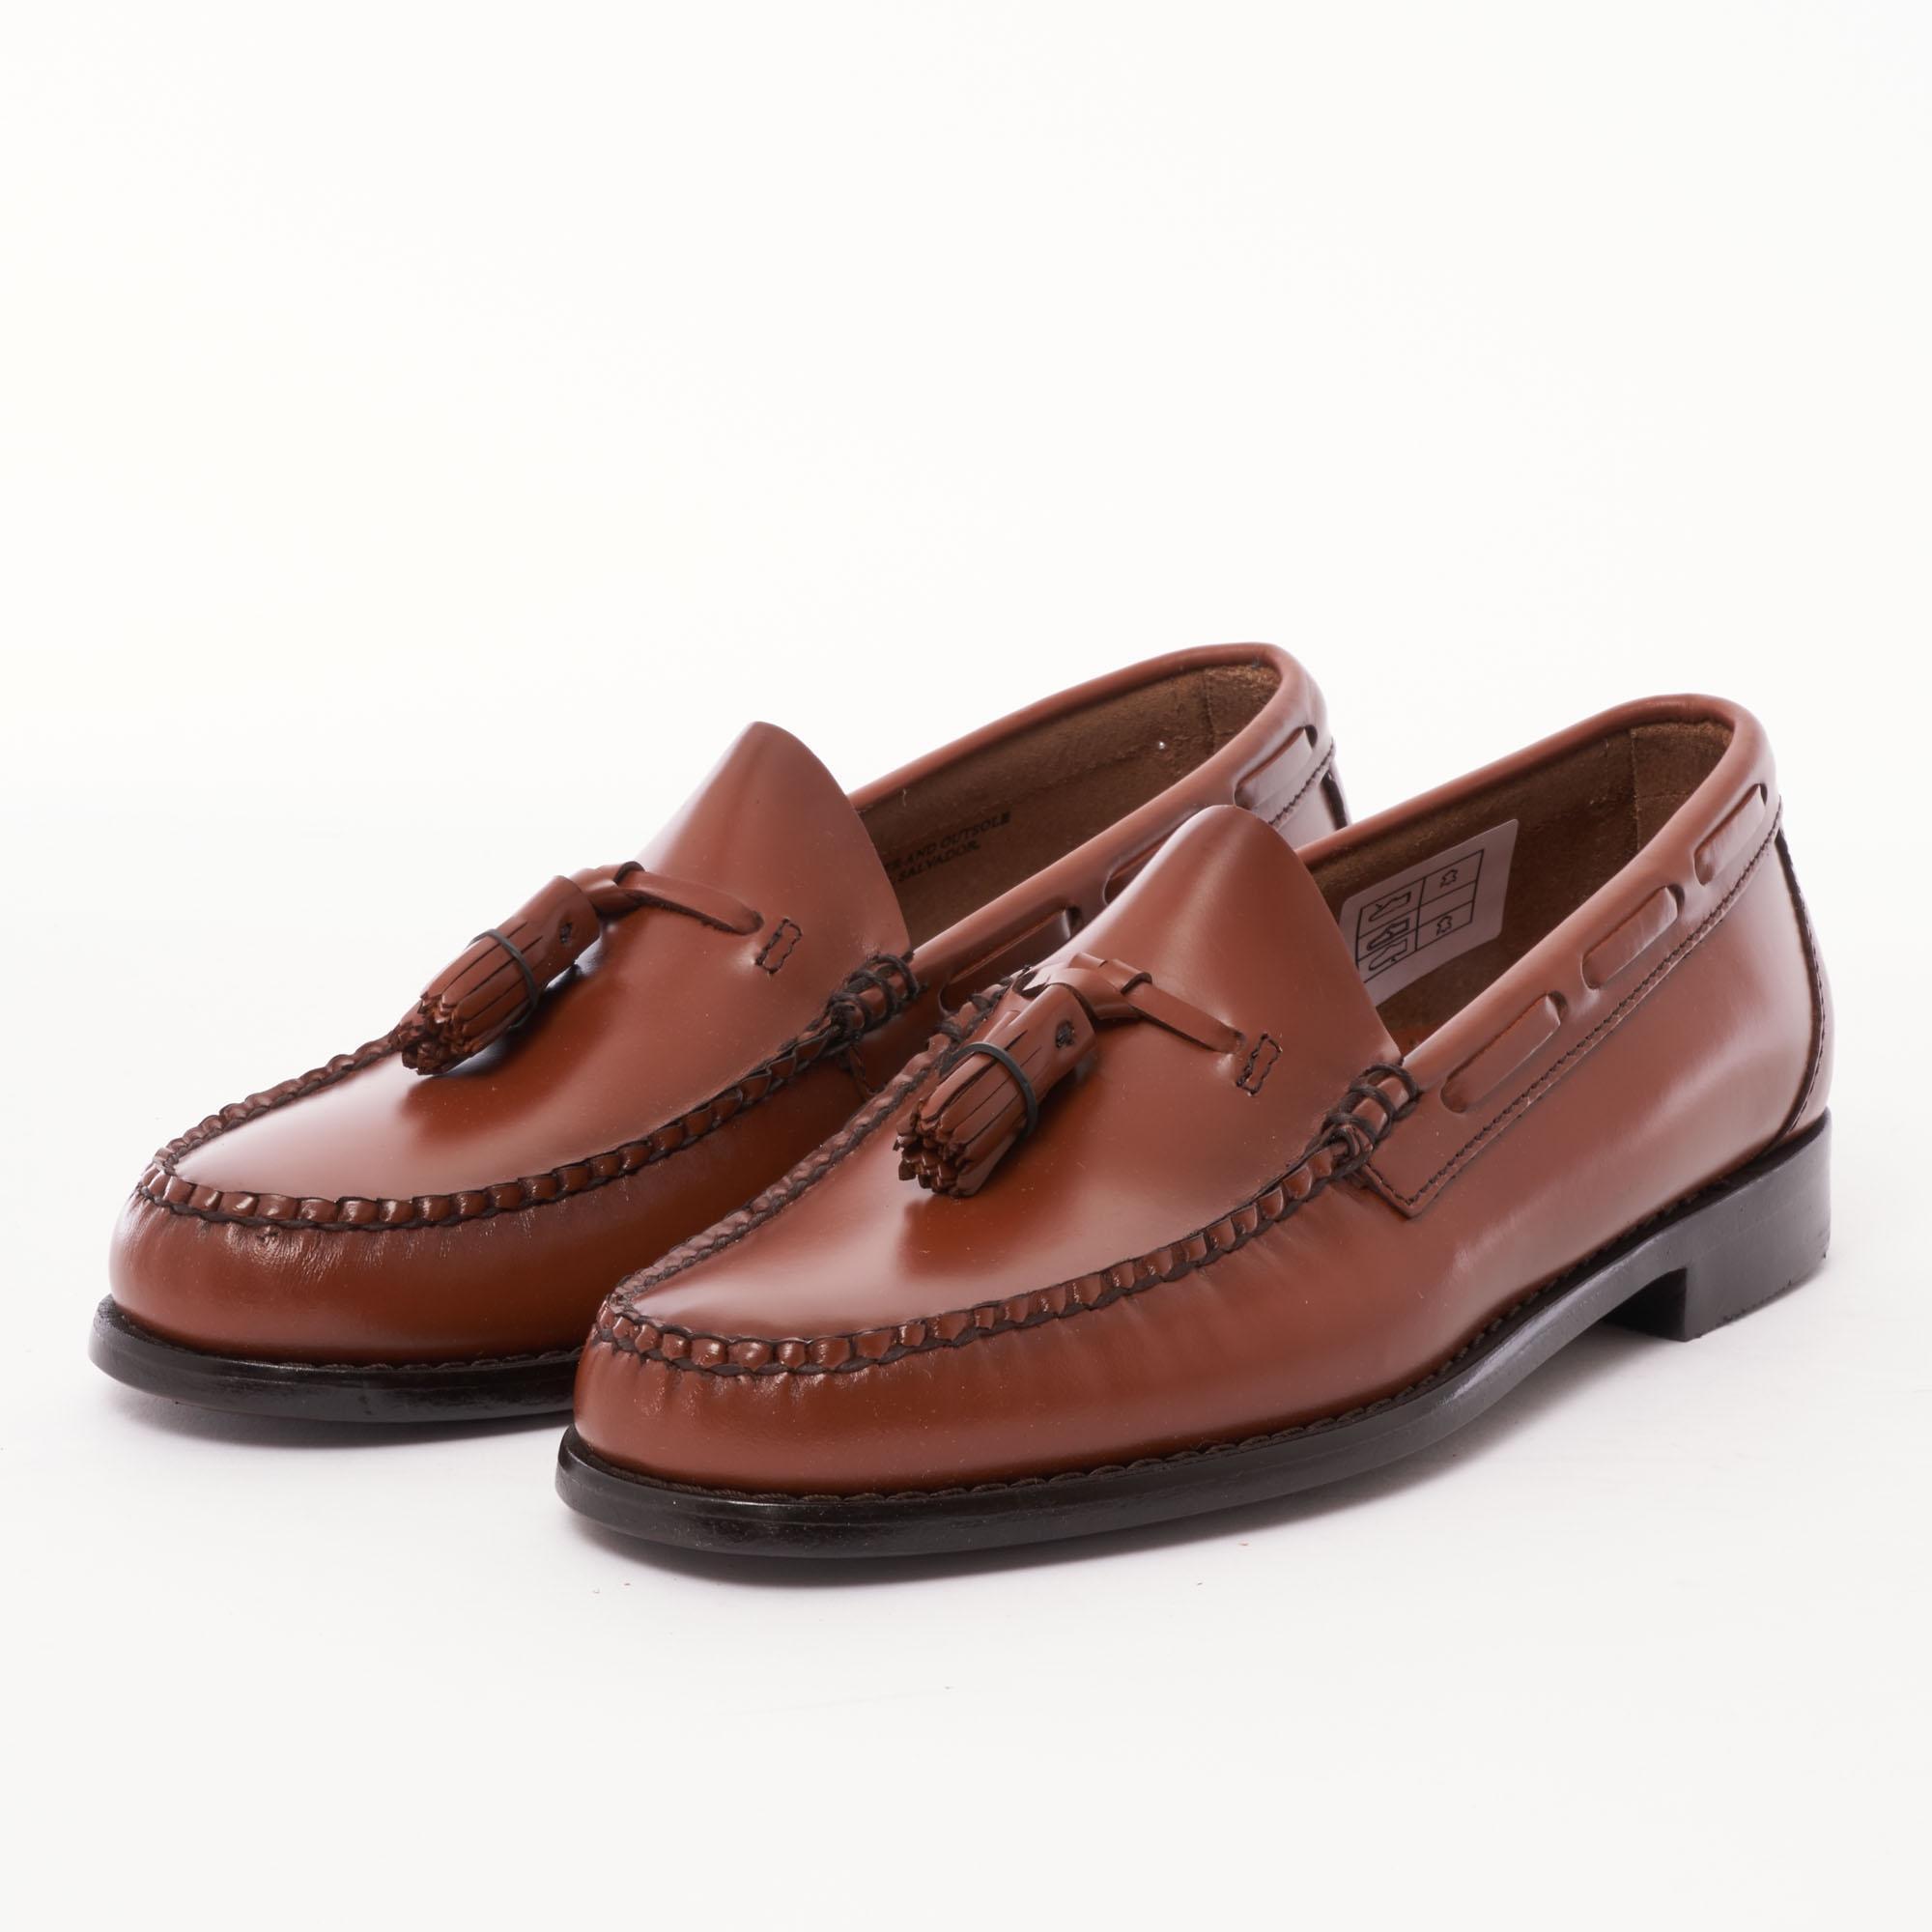 ecdc949115c Lyst - G.H.BASS Larkin Tassel Loafers - Mid Brown in Brown for Men